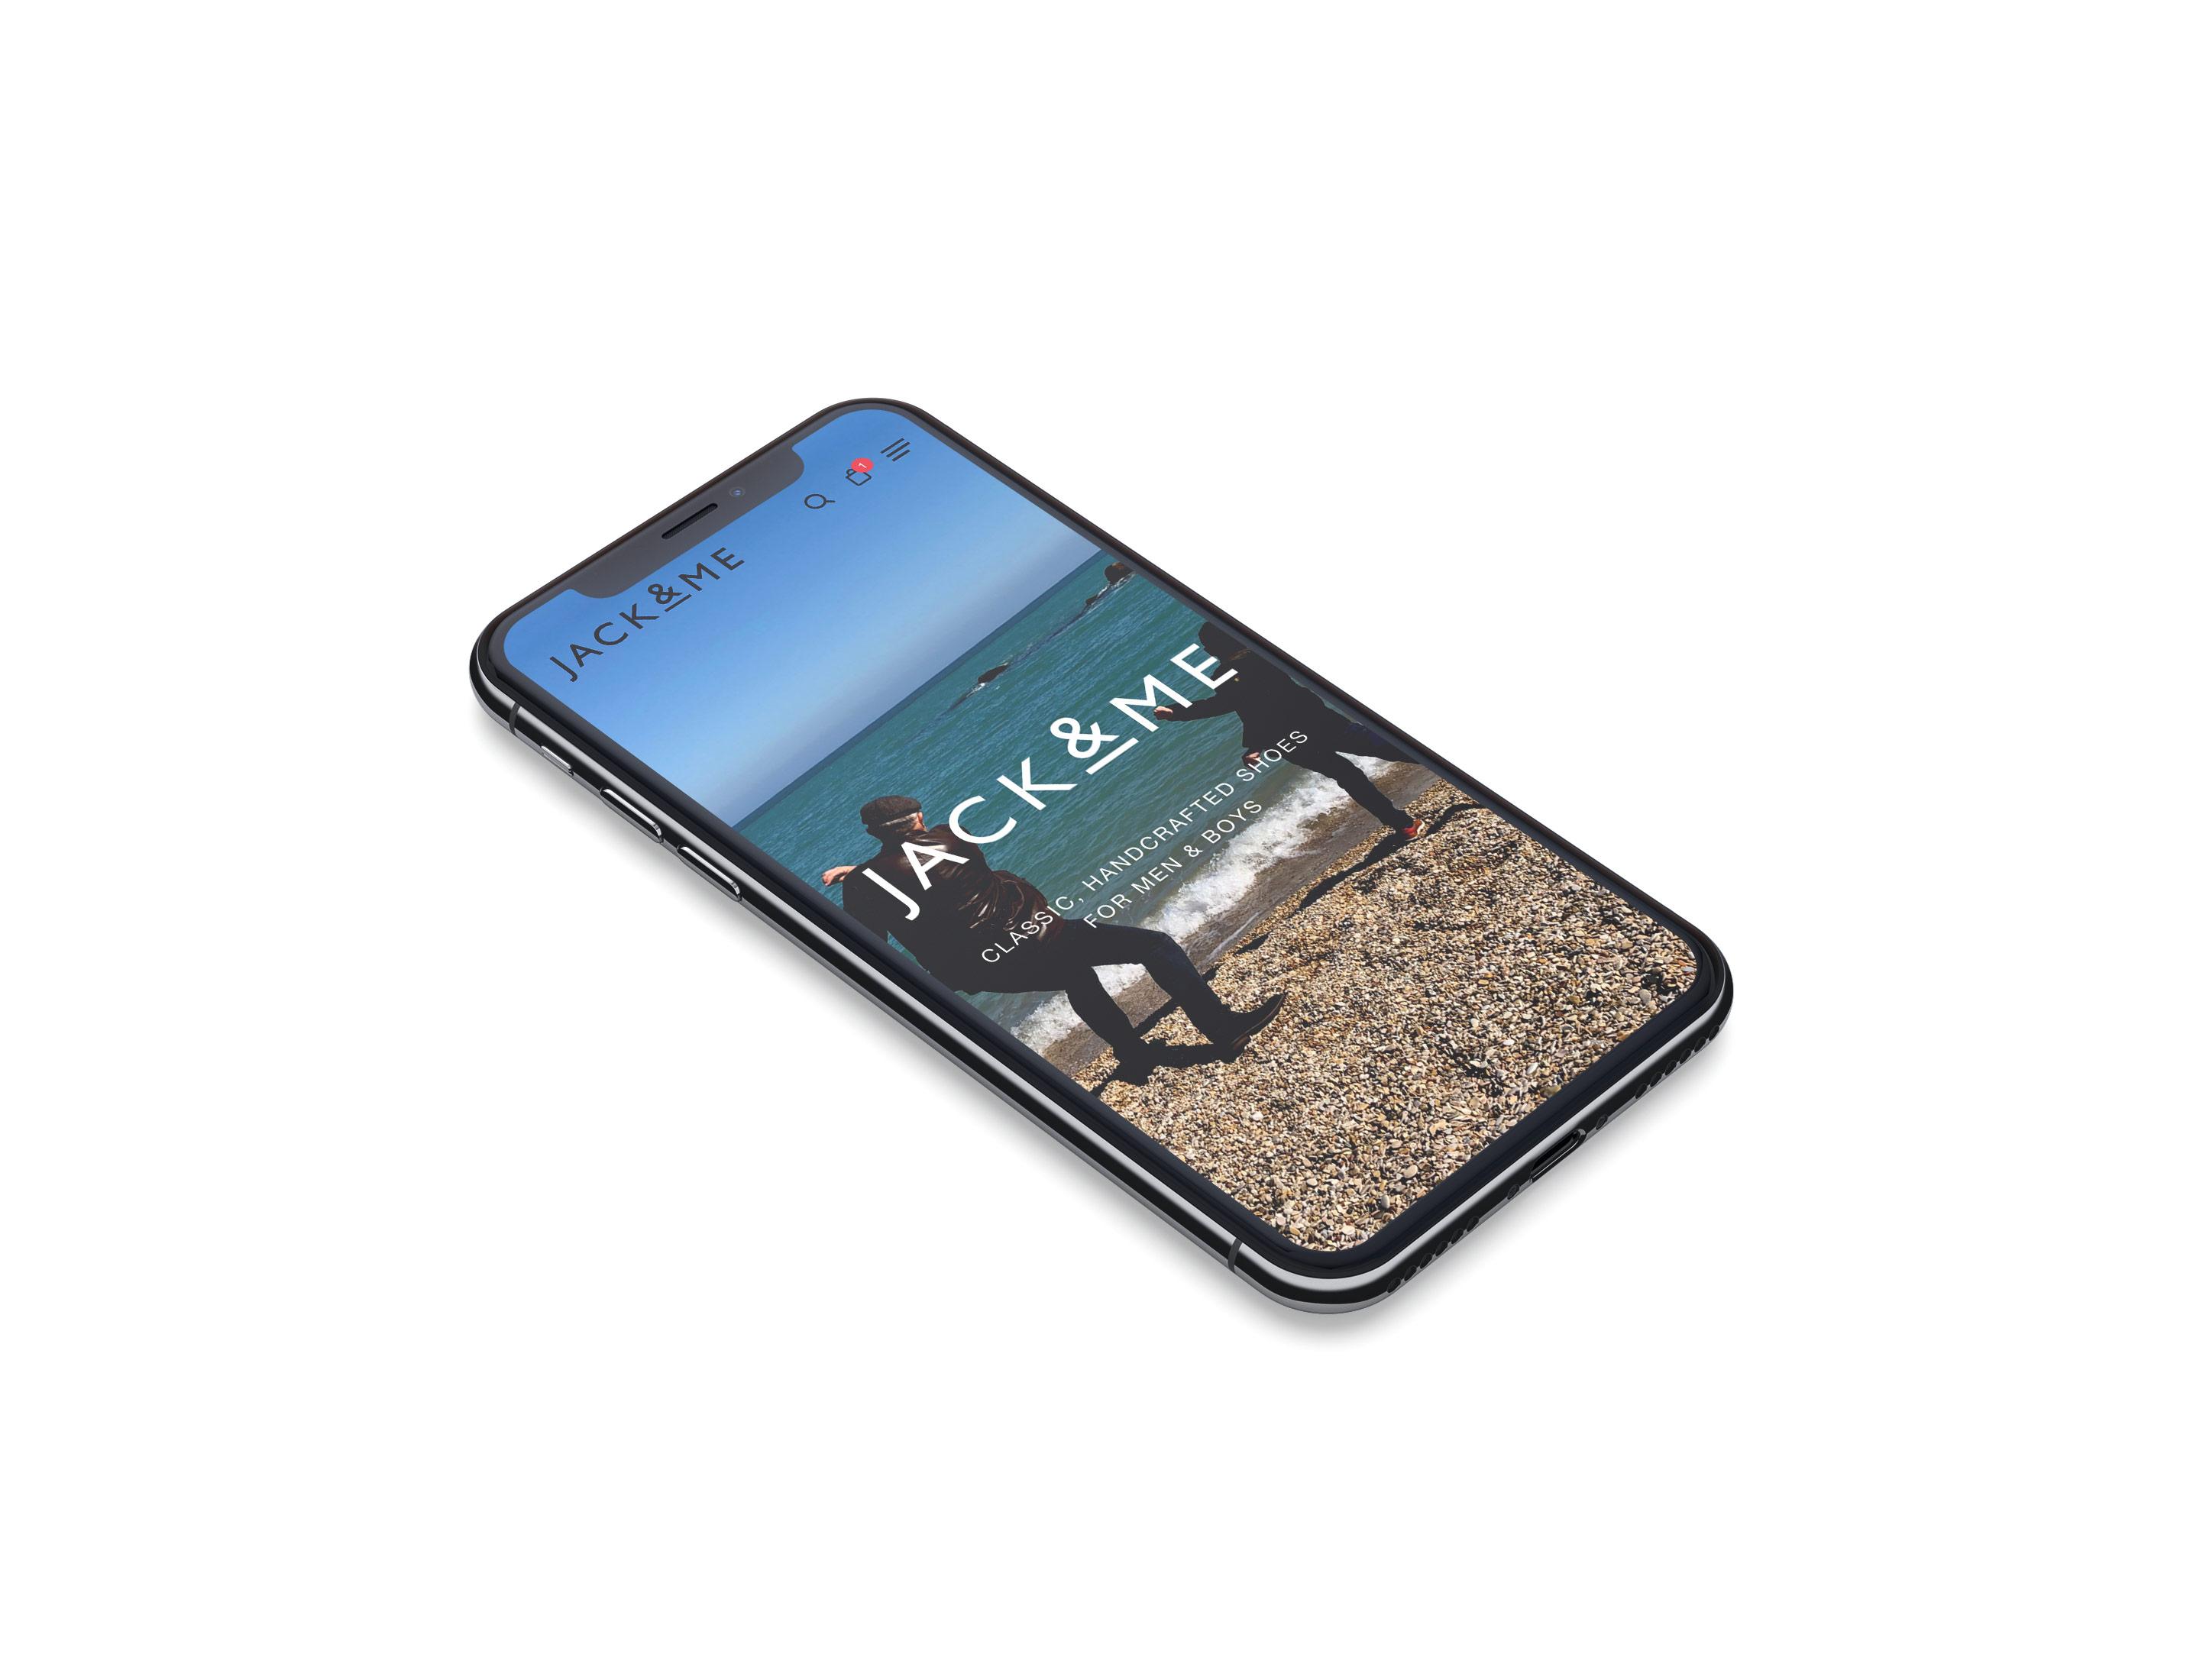 jack and me ecommerce website mockup iphone